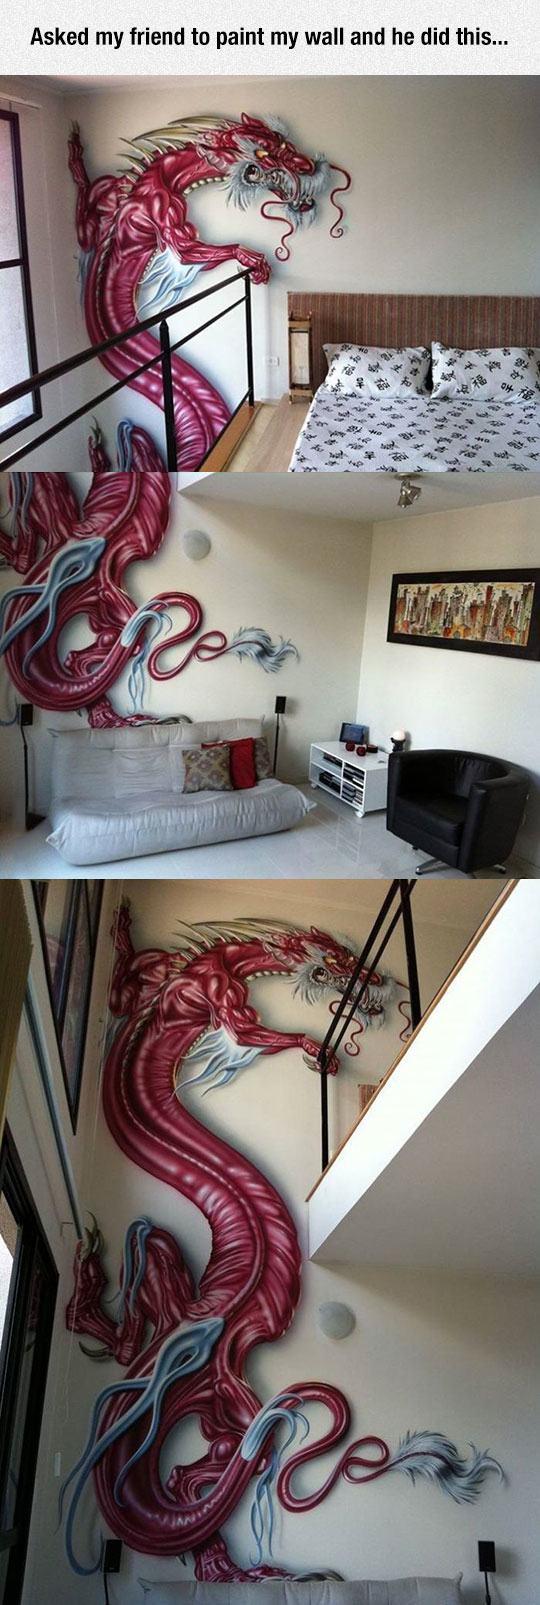 cool-dragon-wall-painting-1